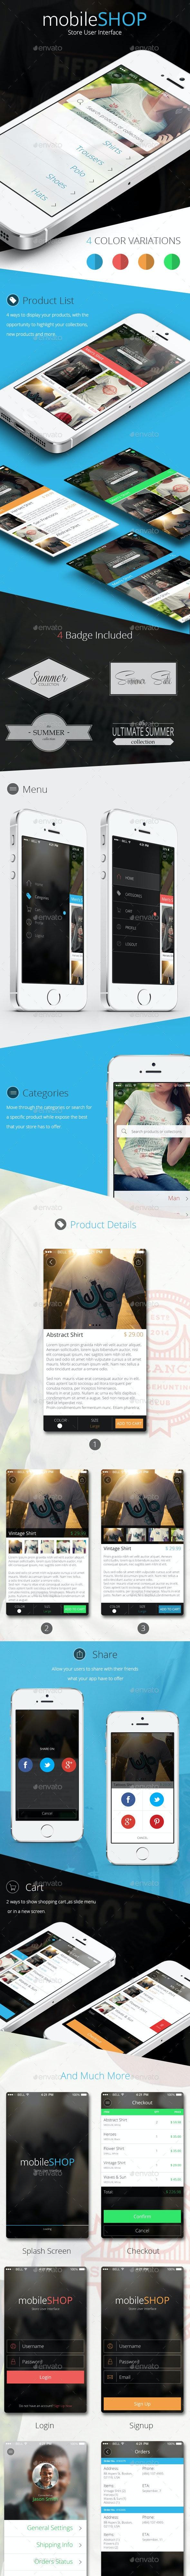 MobileShop - App Store UI Kit